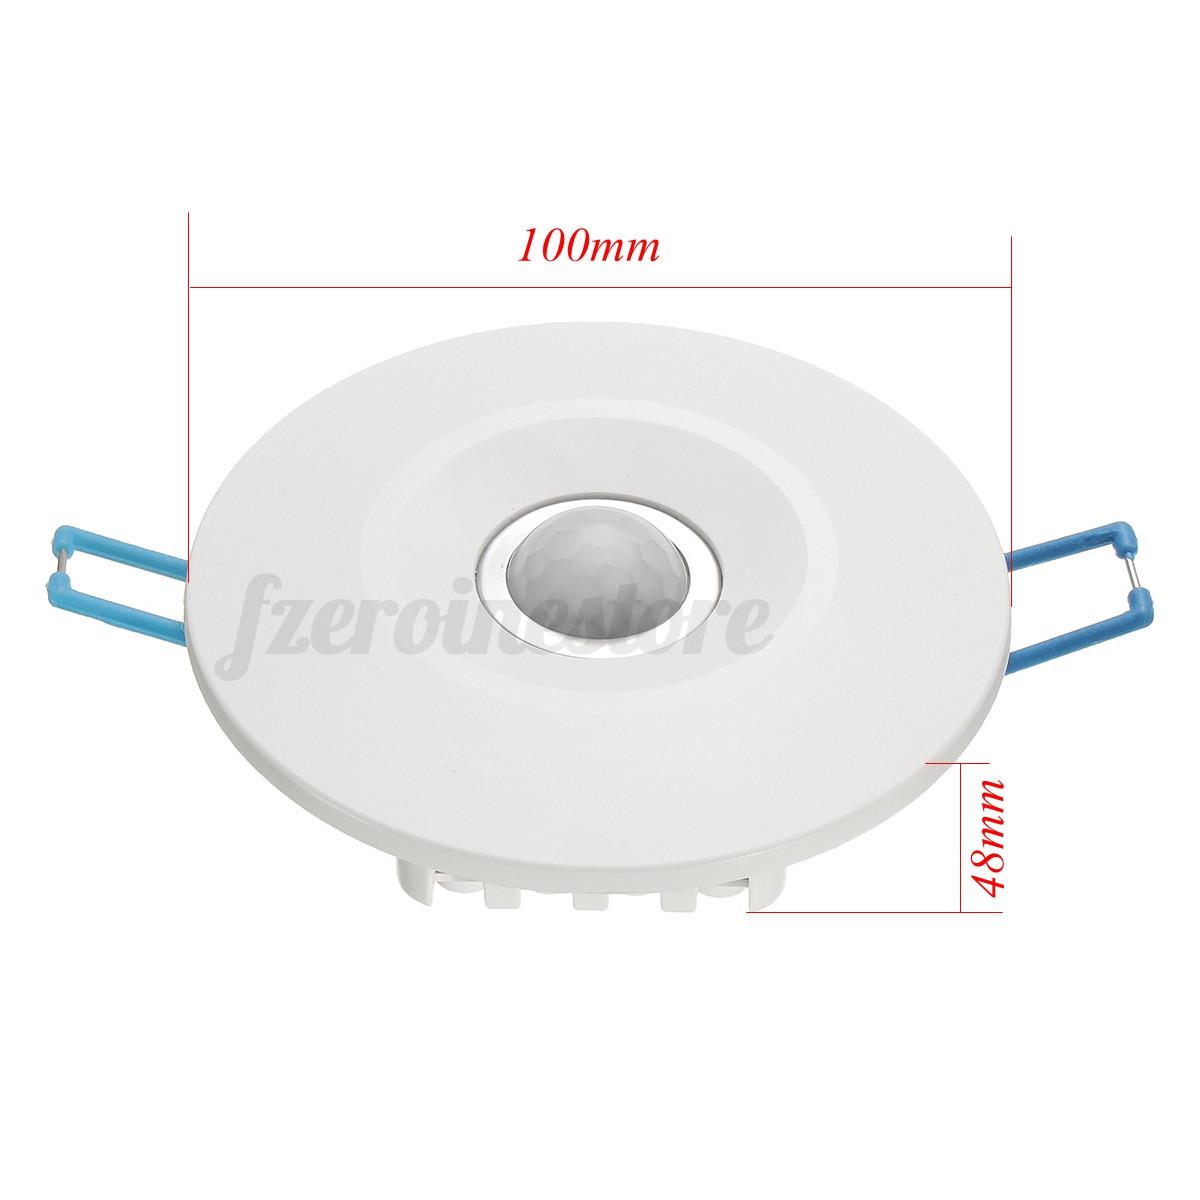 Livarno Lux Ceiling Light With Motion Sensor Instructions: 360° PIR Ceiling Occupancy Recessed Motion Sensor Detector